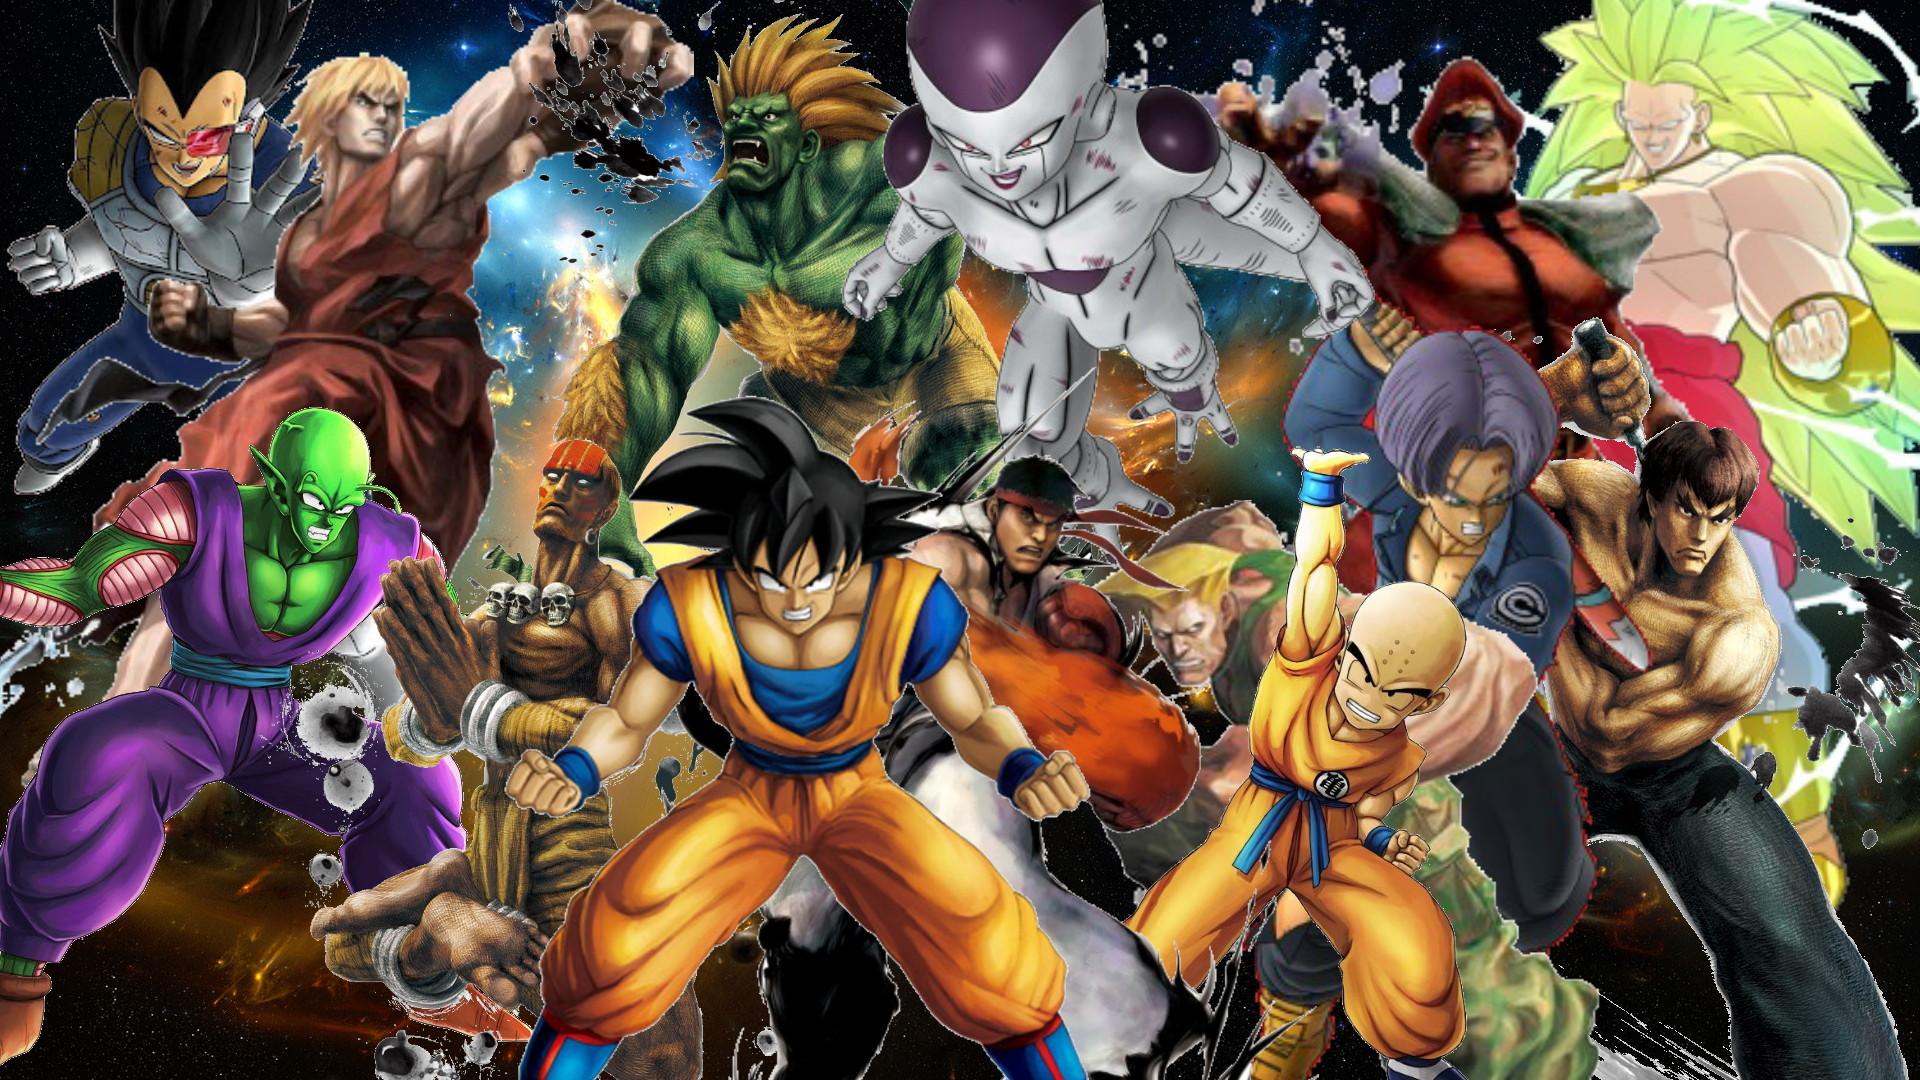 Dragon Ball Z Wallpaper 66 Images